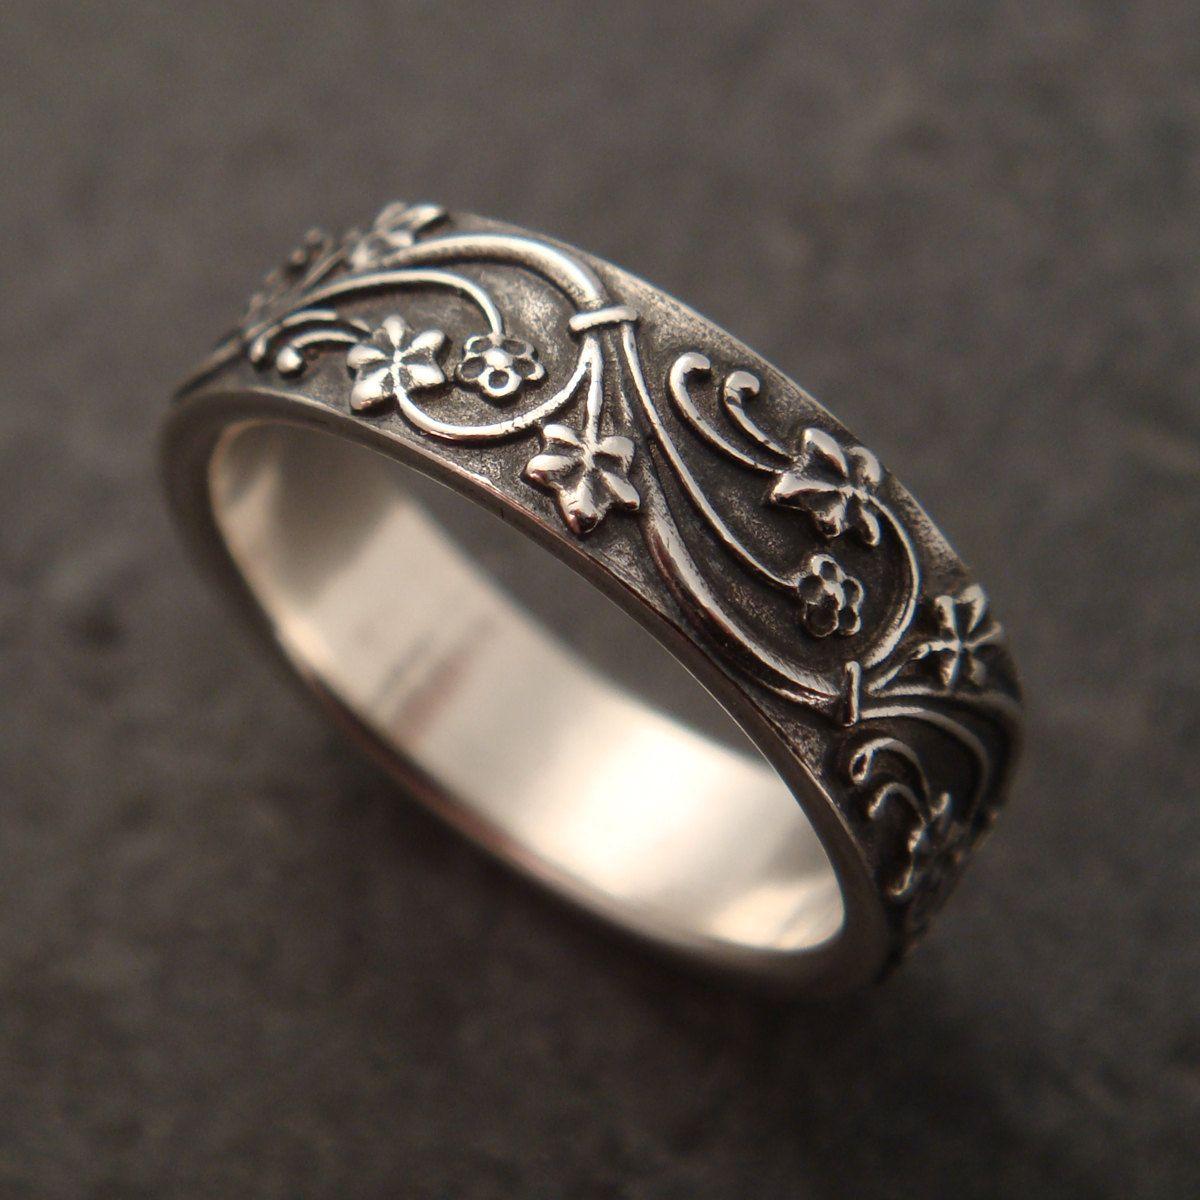 Silver Wedding Band Set Wedding Rings Silver Wedding Ring Mens Etsy Wedding Band Sets Silver Wedding Bands Mens Wedding Rings